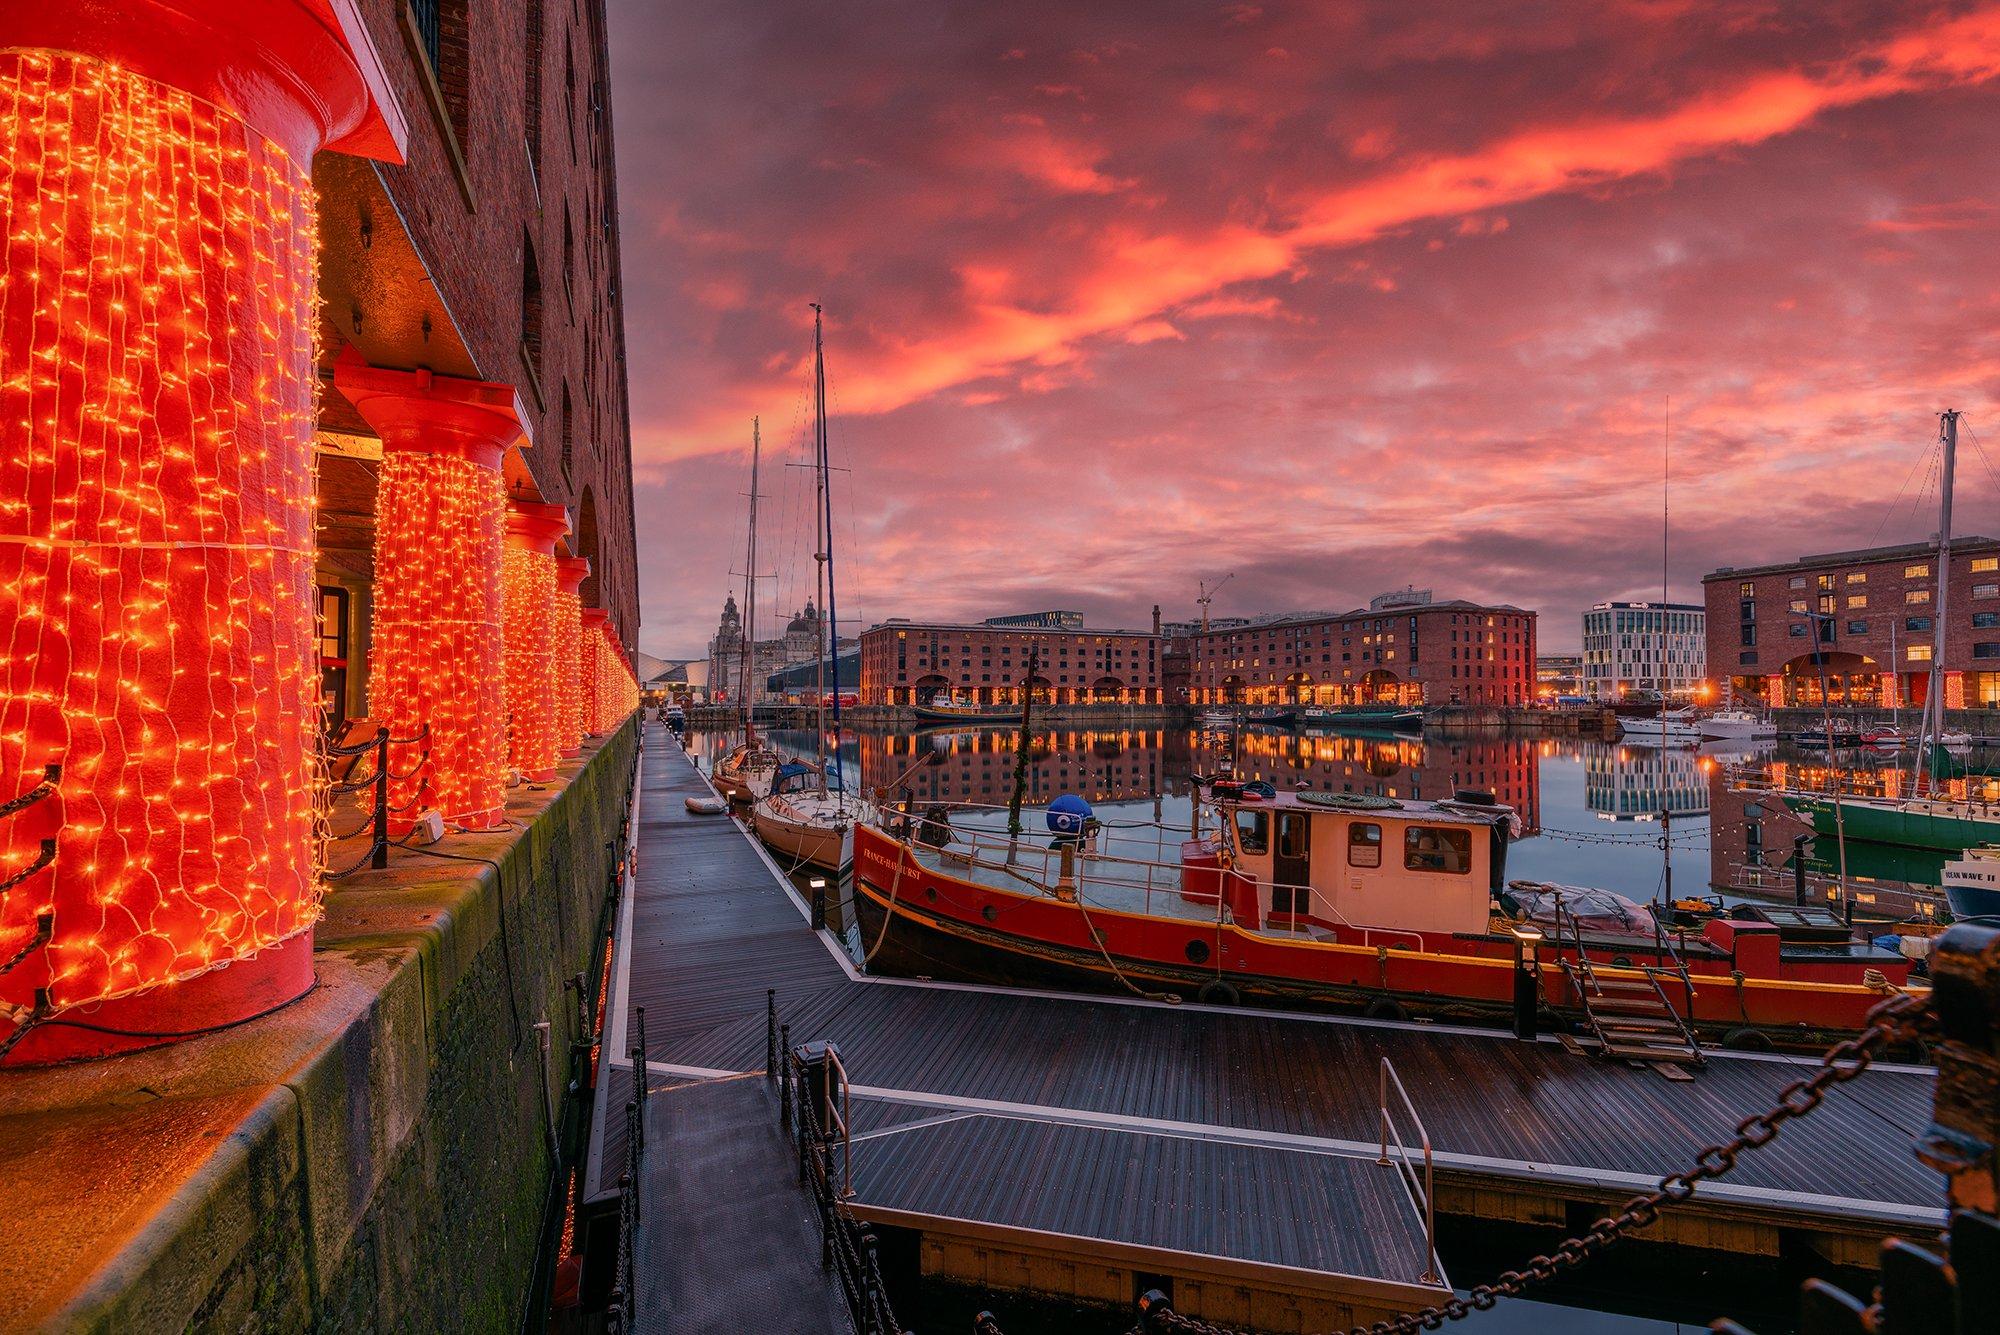 Royal Albert Dock, Liverpool at Christmas